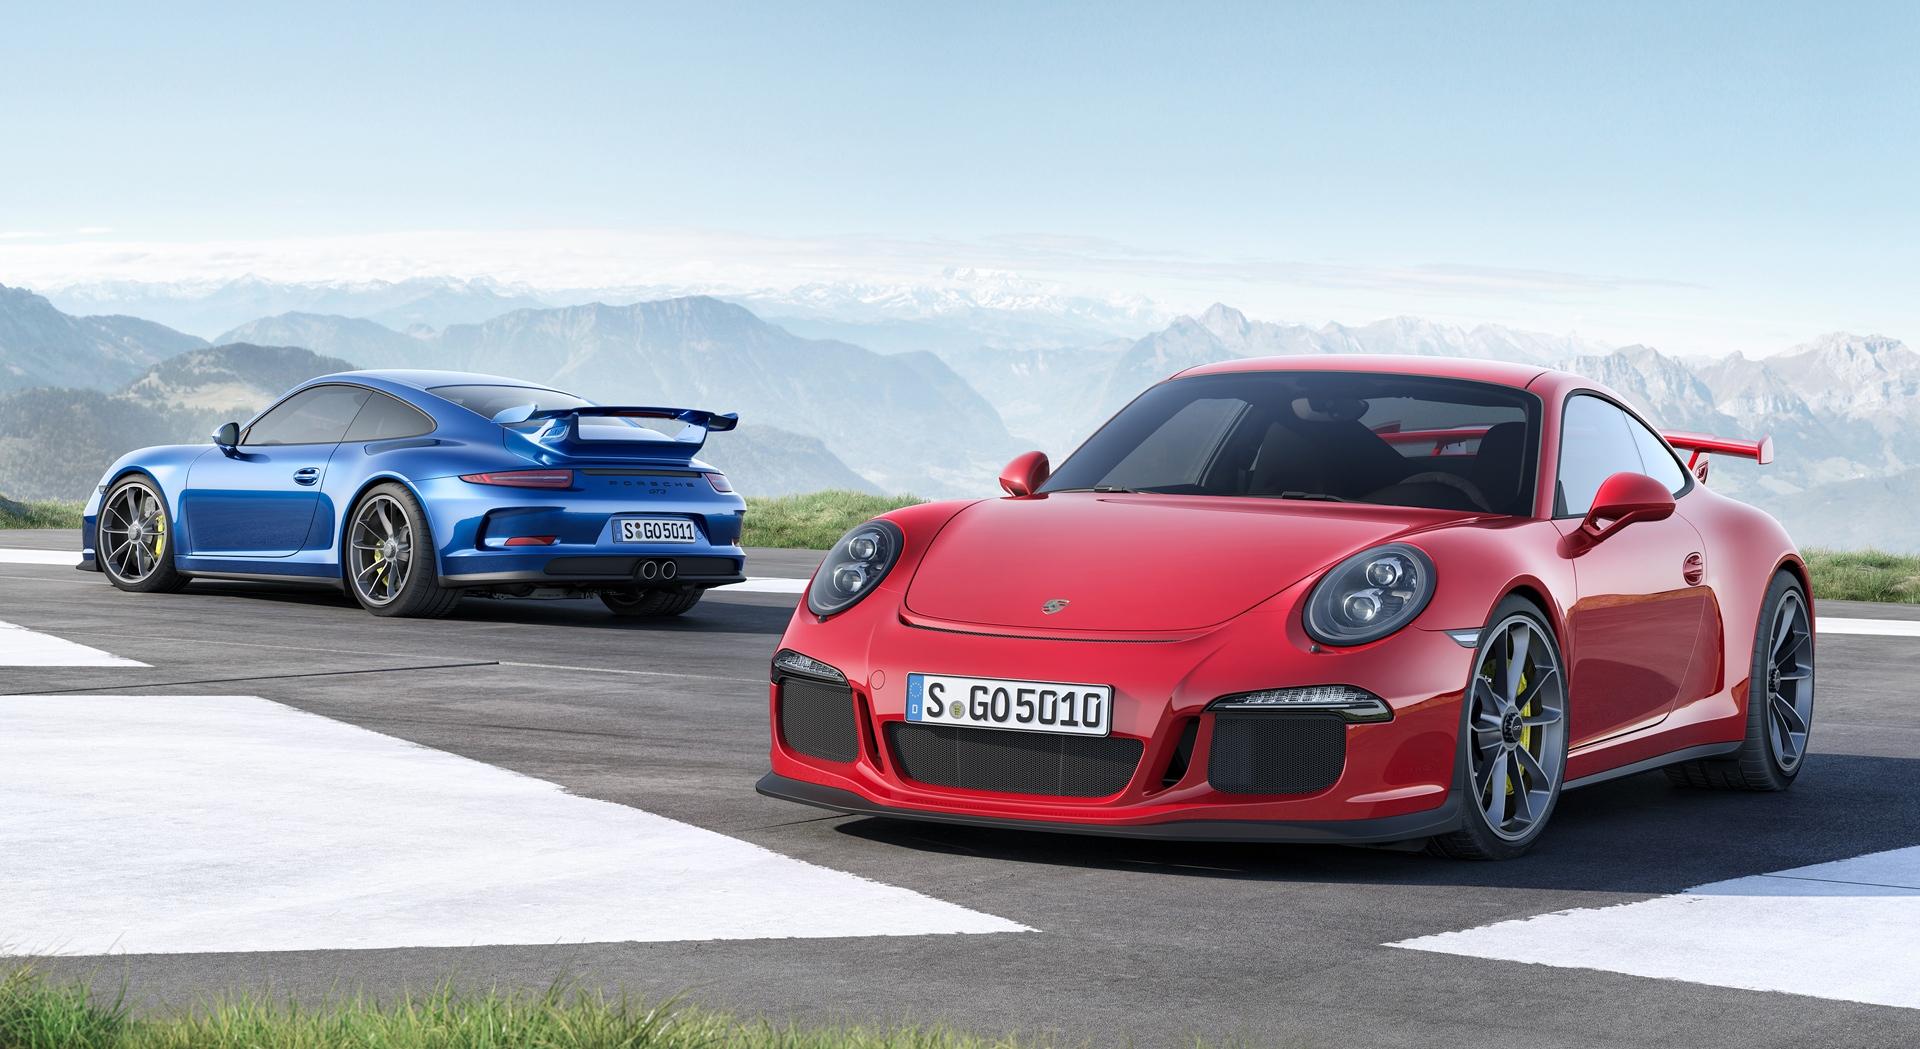 Audi A6 3d Wallpaper Porsche 911 Turbo S Hd Desktop Wallpapers 4k Hd